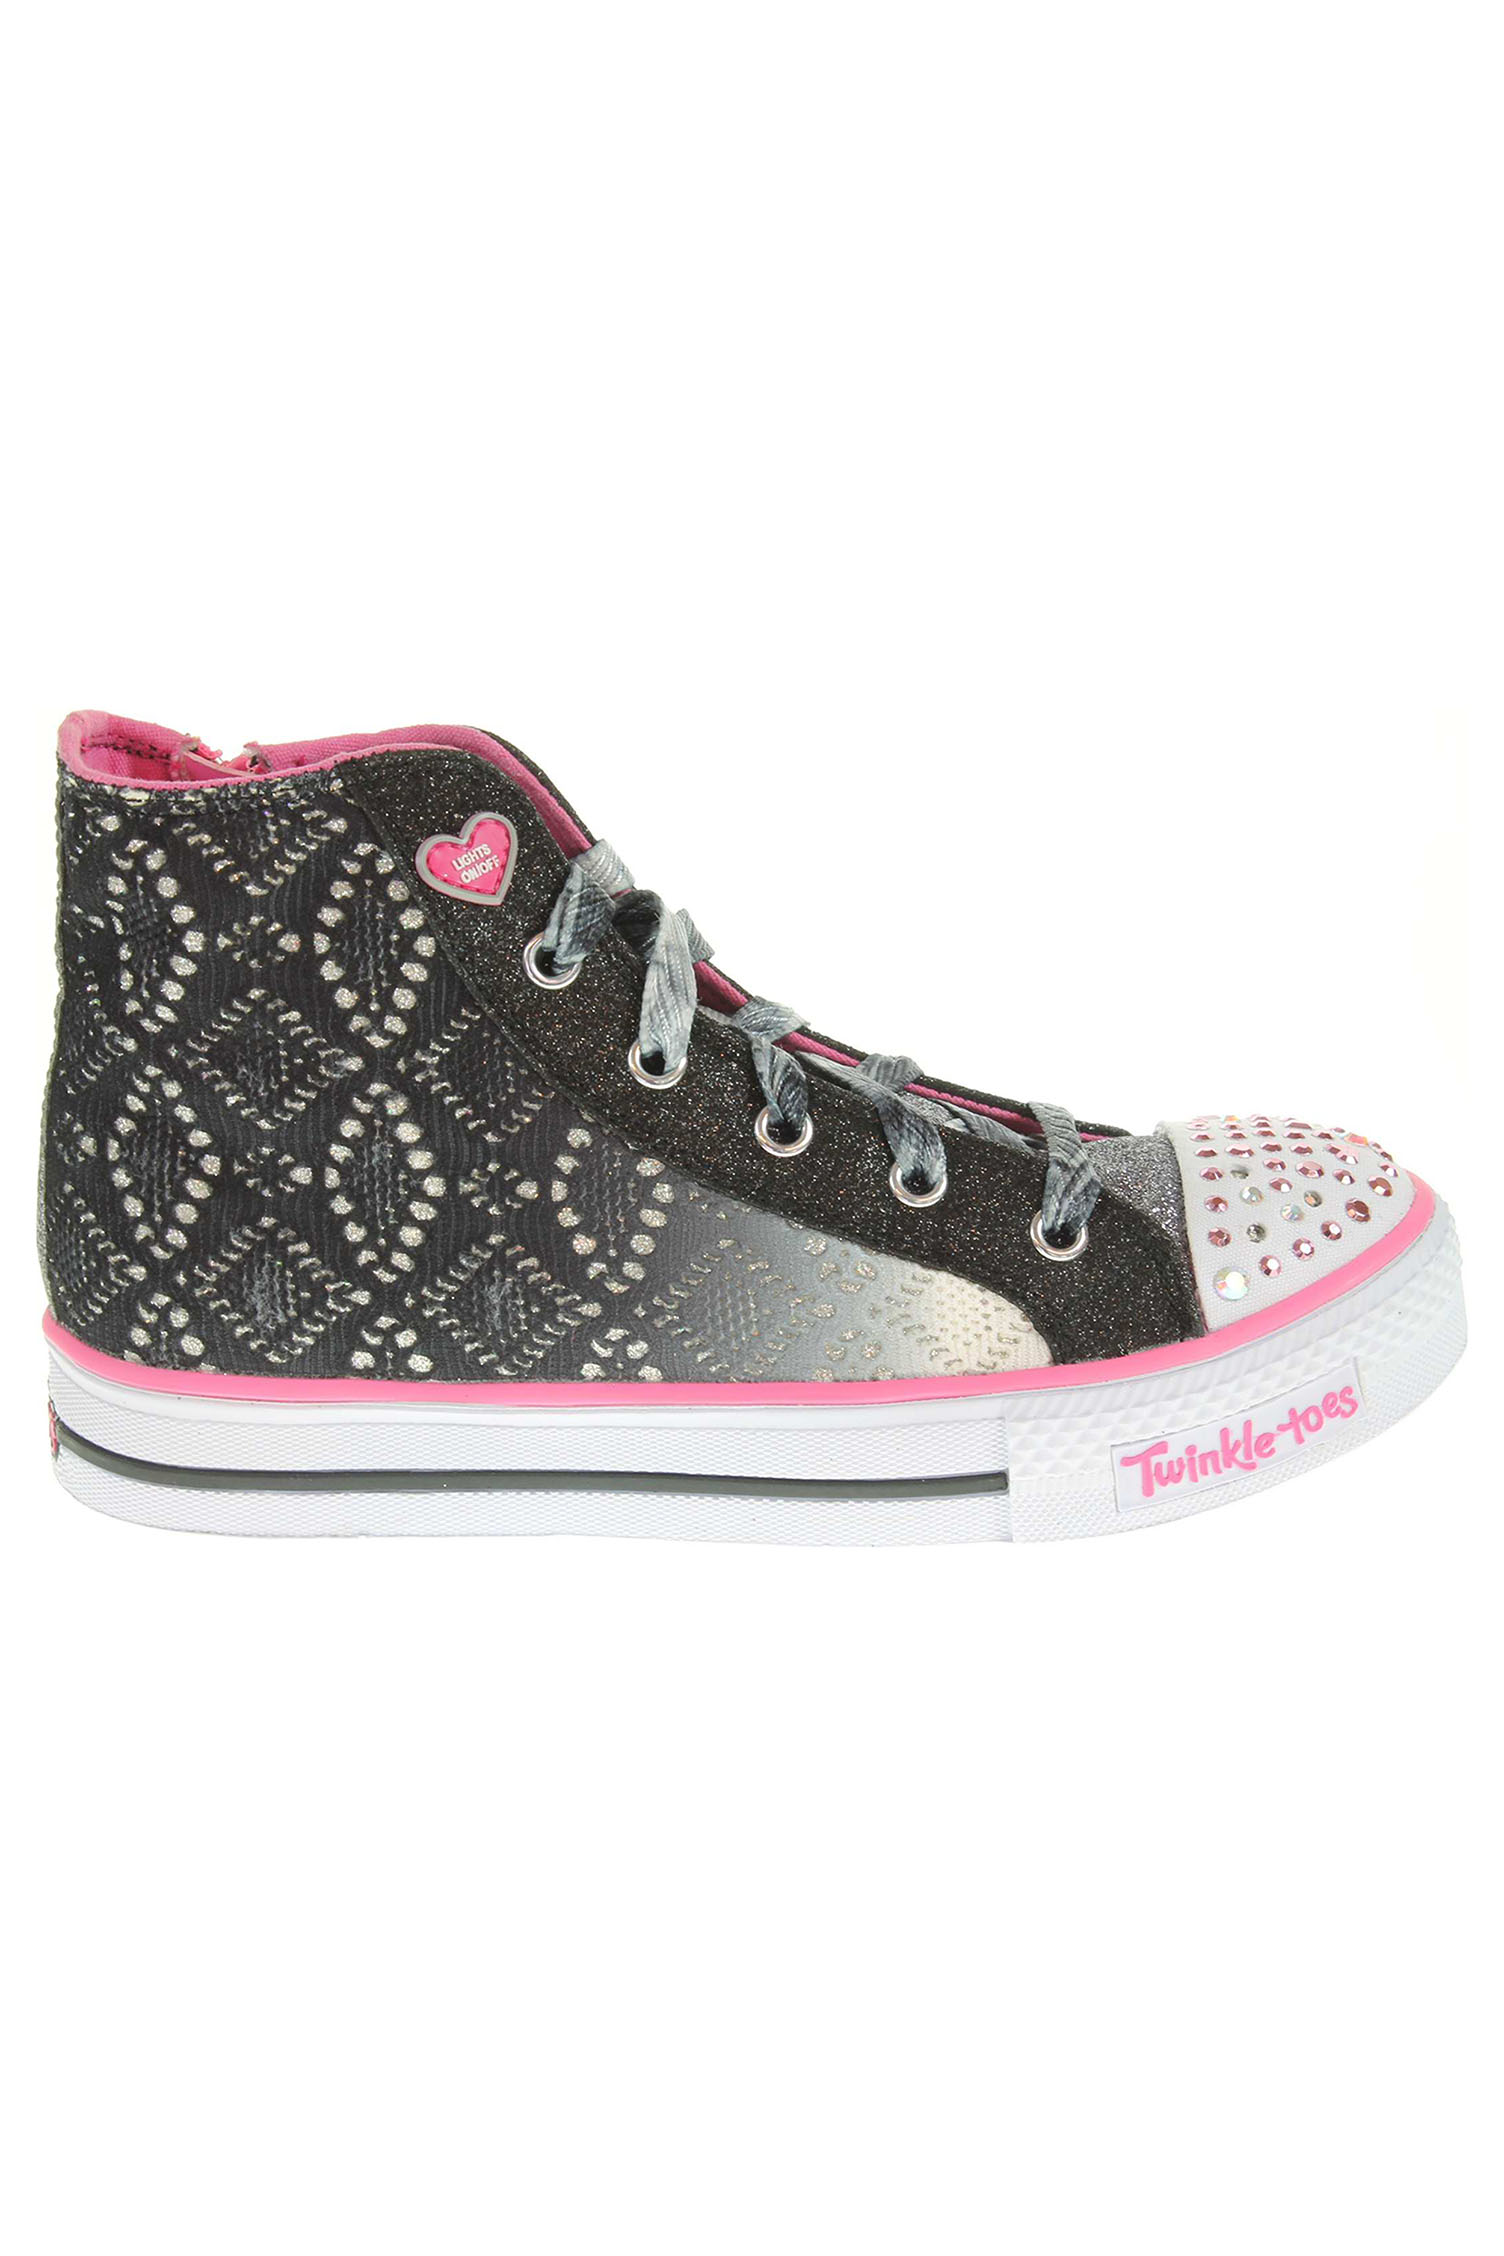 Skechers Magic Madness black-pink - Glami.cz ec18b04ce7